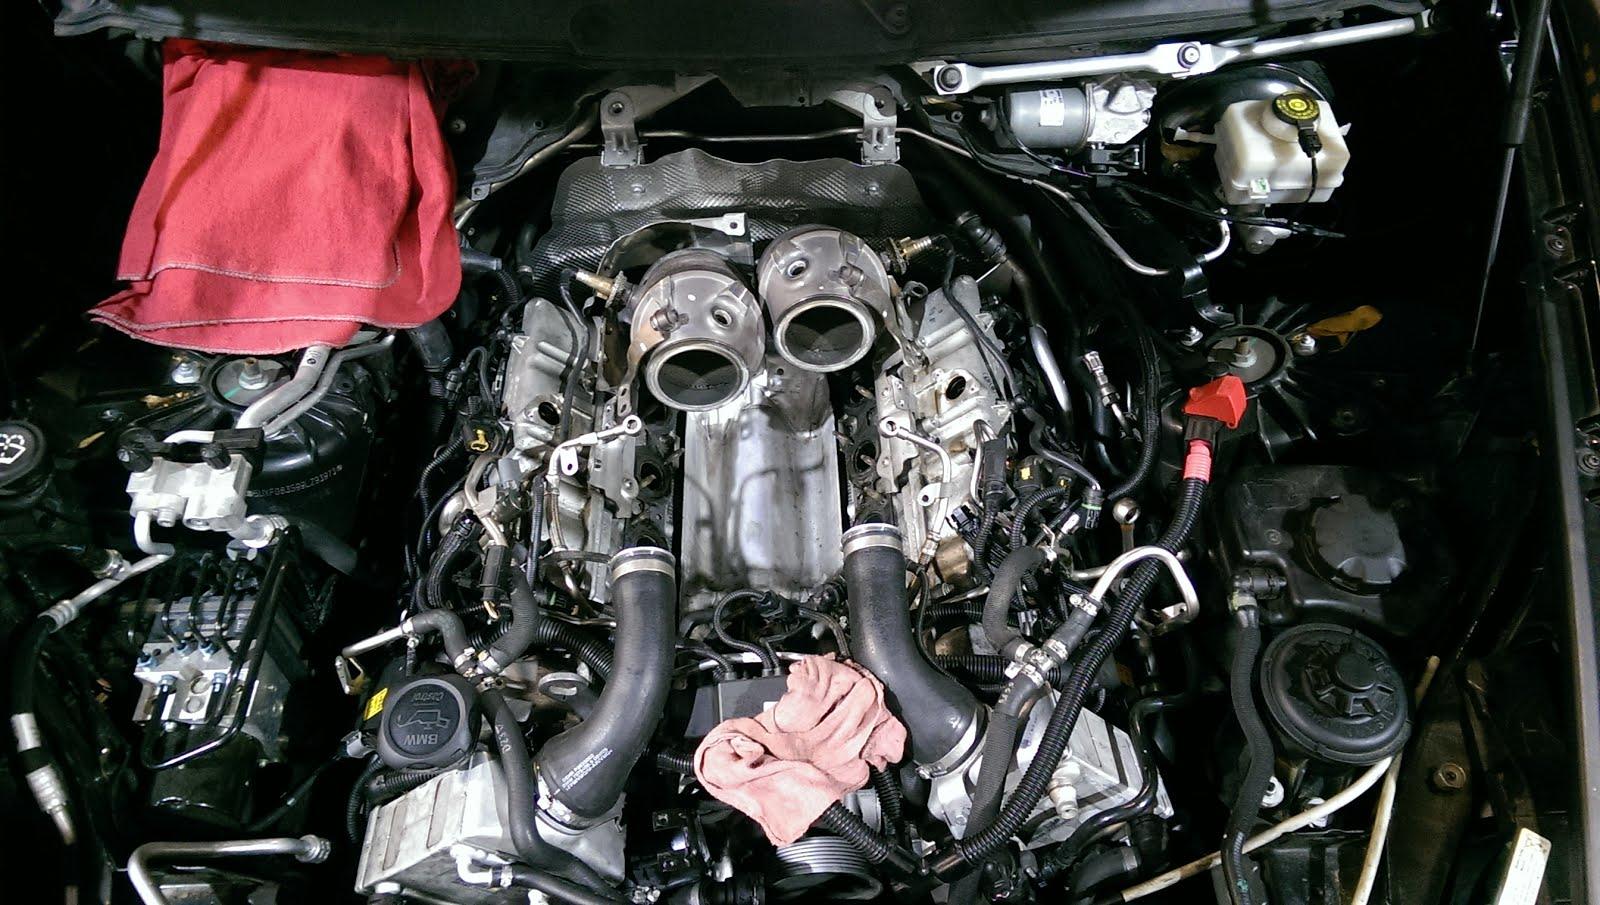 Bmw Head Gasket Replacement Cost >> BMW Virtuoso: BMW N63 Valve Stem Seals